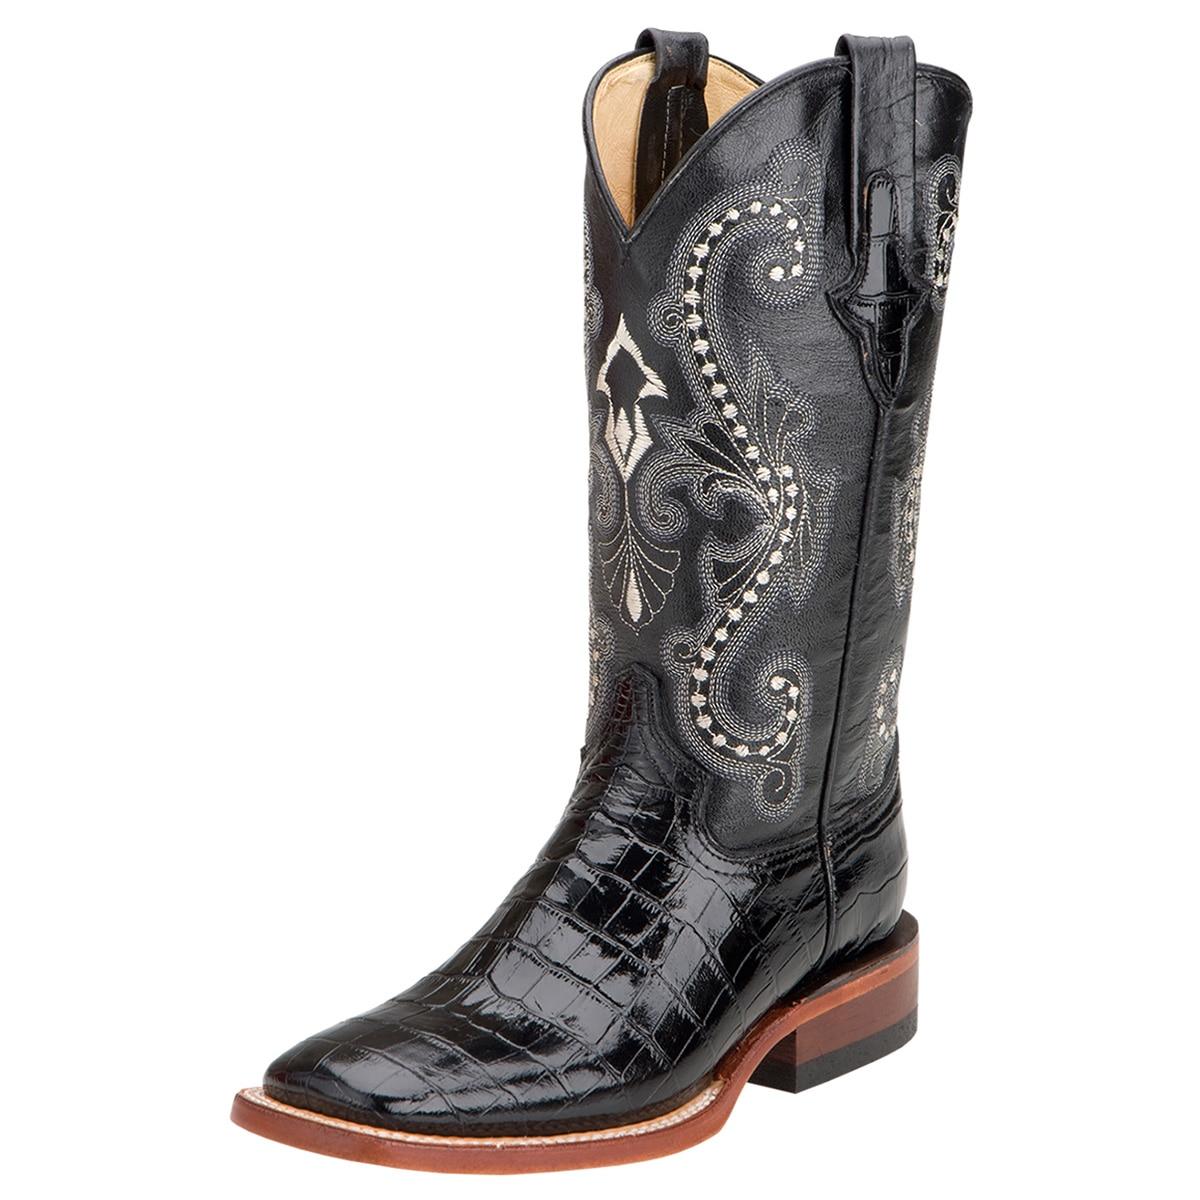 Ferrini Women's Print Belly Alligator Wide Square Toe Boots